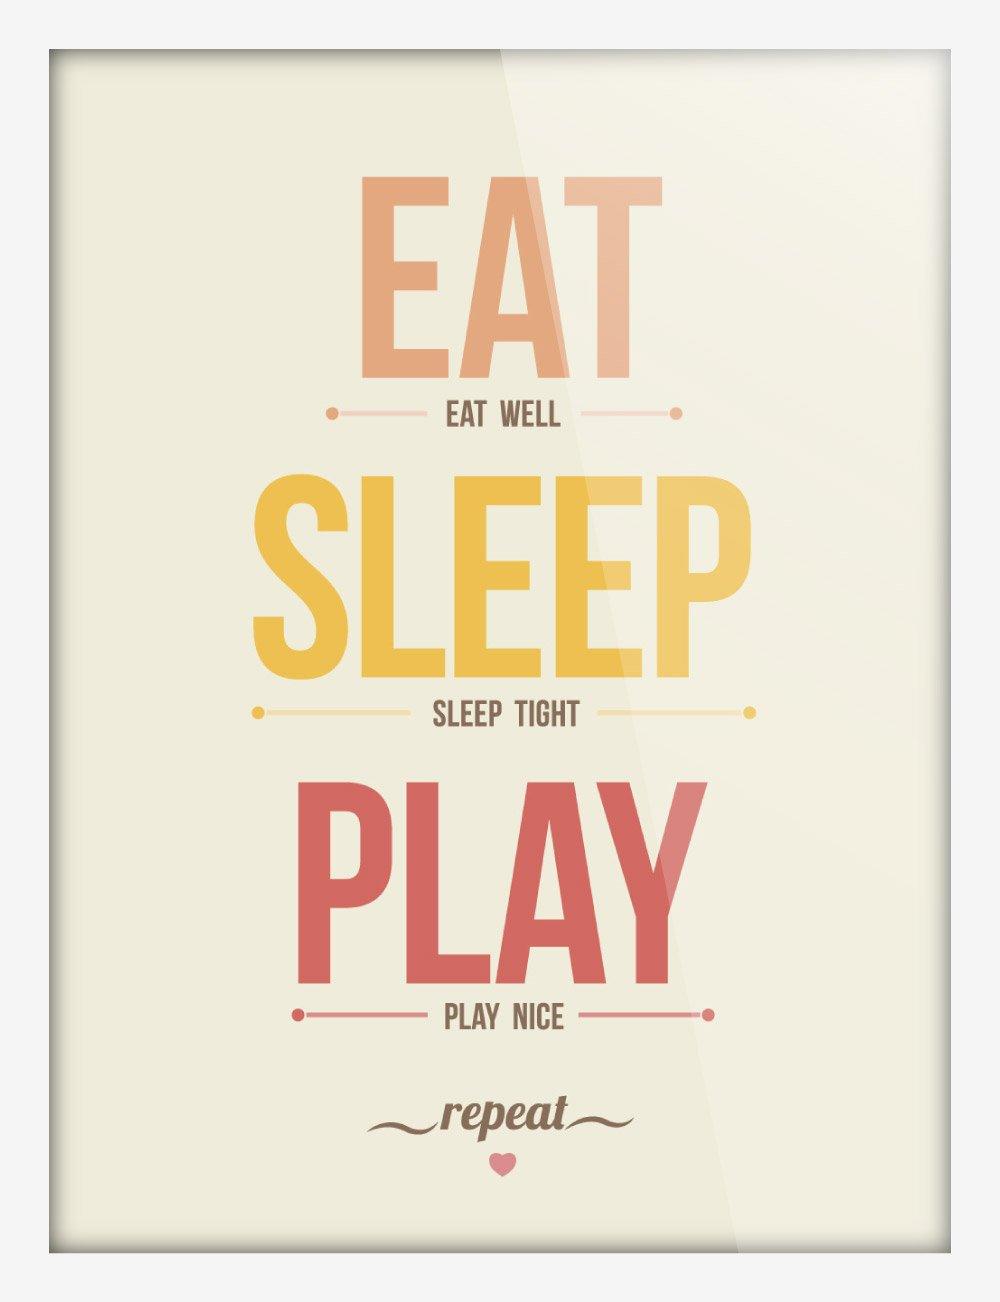 art 轻艺术 图说语录 吃睡玩 a款黄色 北欧英文字母图片儿童房海报图片